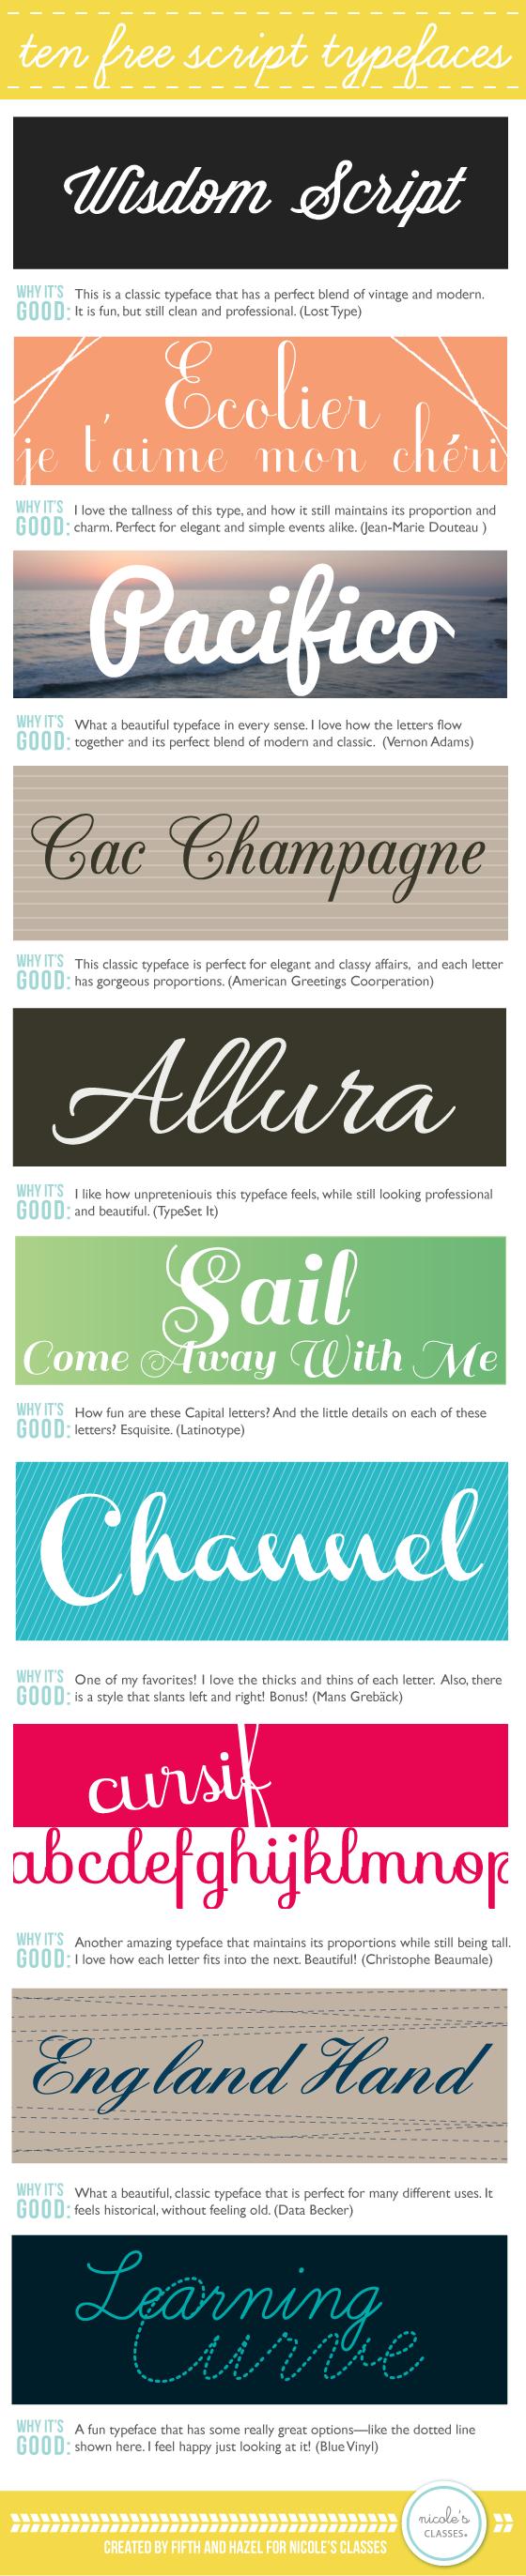 10 Free Typefaces